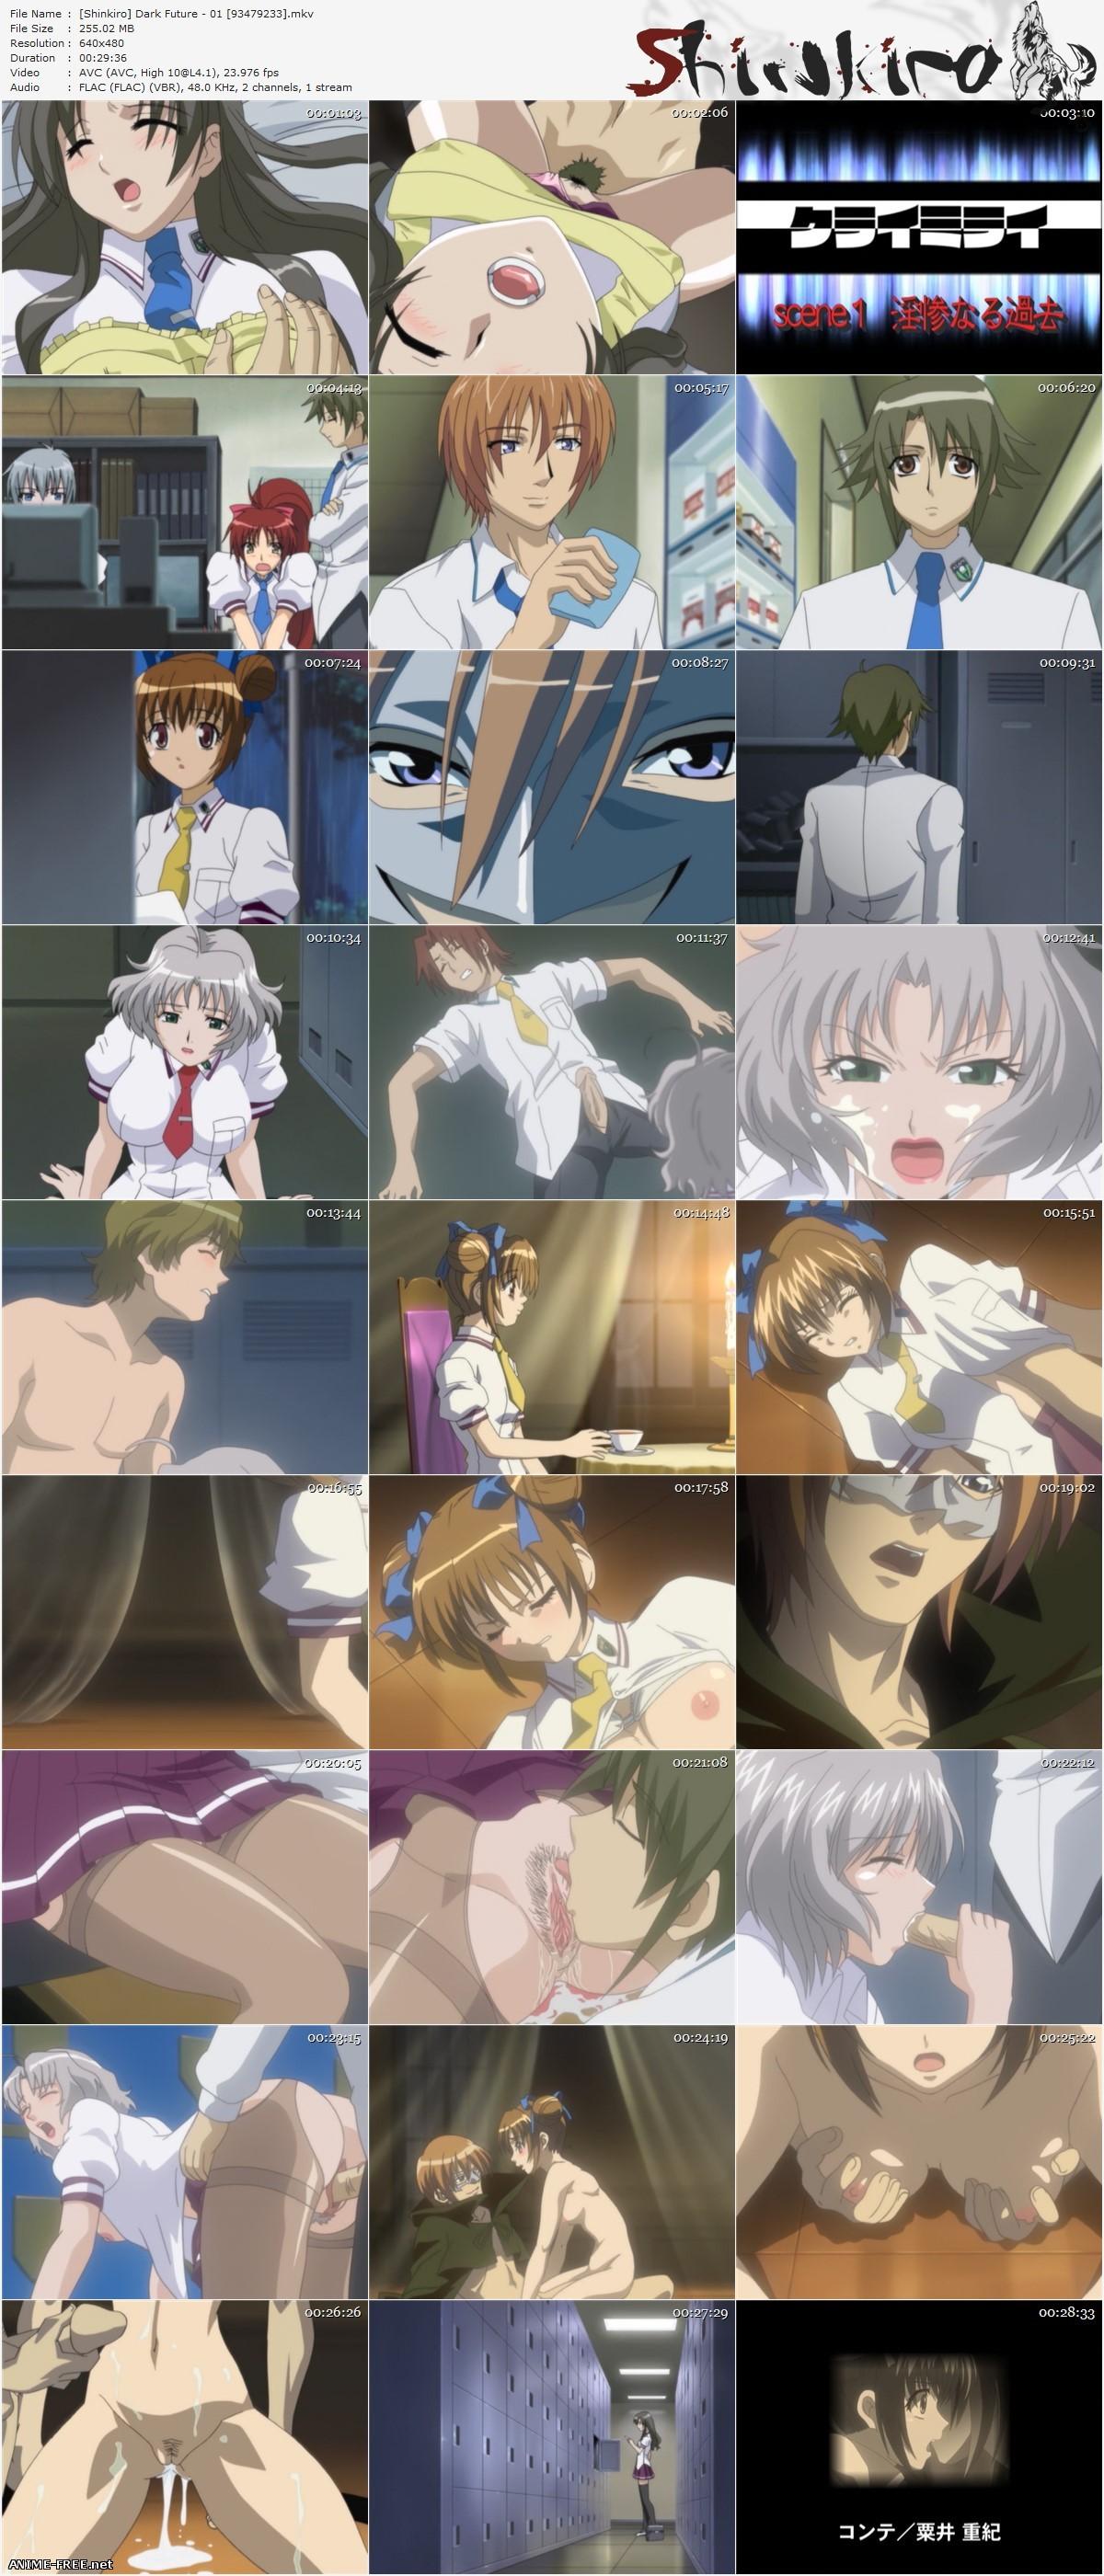 Dark Future / Kurai Mirai / Тёмное будущее [2 из 2] [RUS,ENG,JAP] Anime Hentai